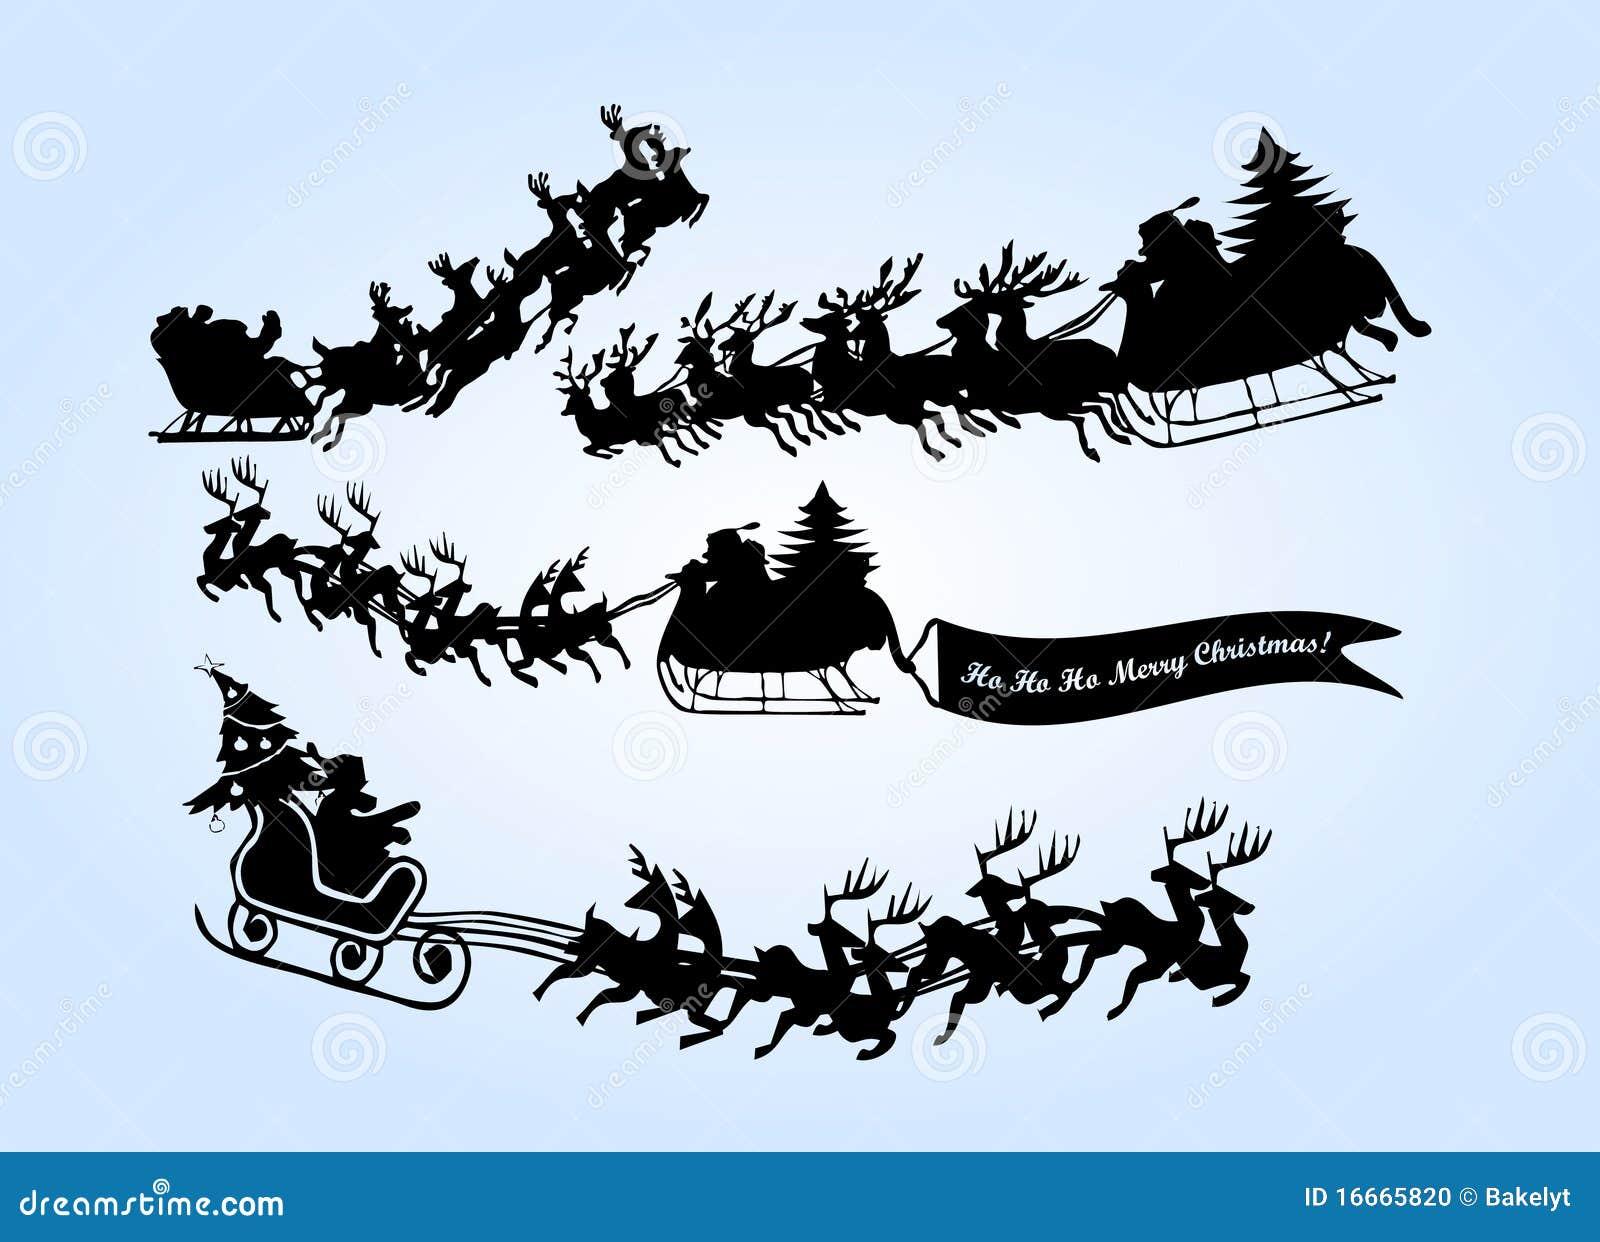 Flying Santa With Reinder Stock Photo - Image: 16665820